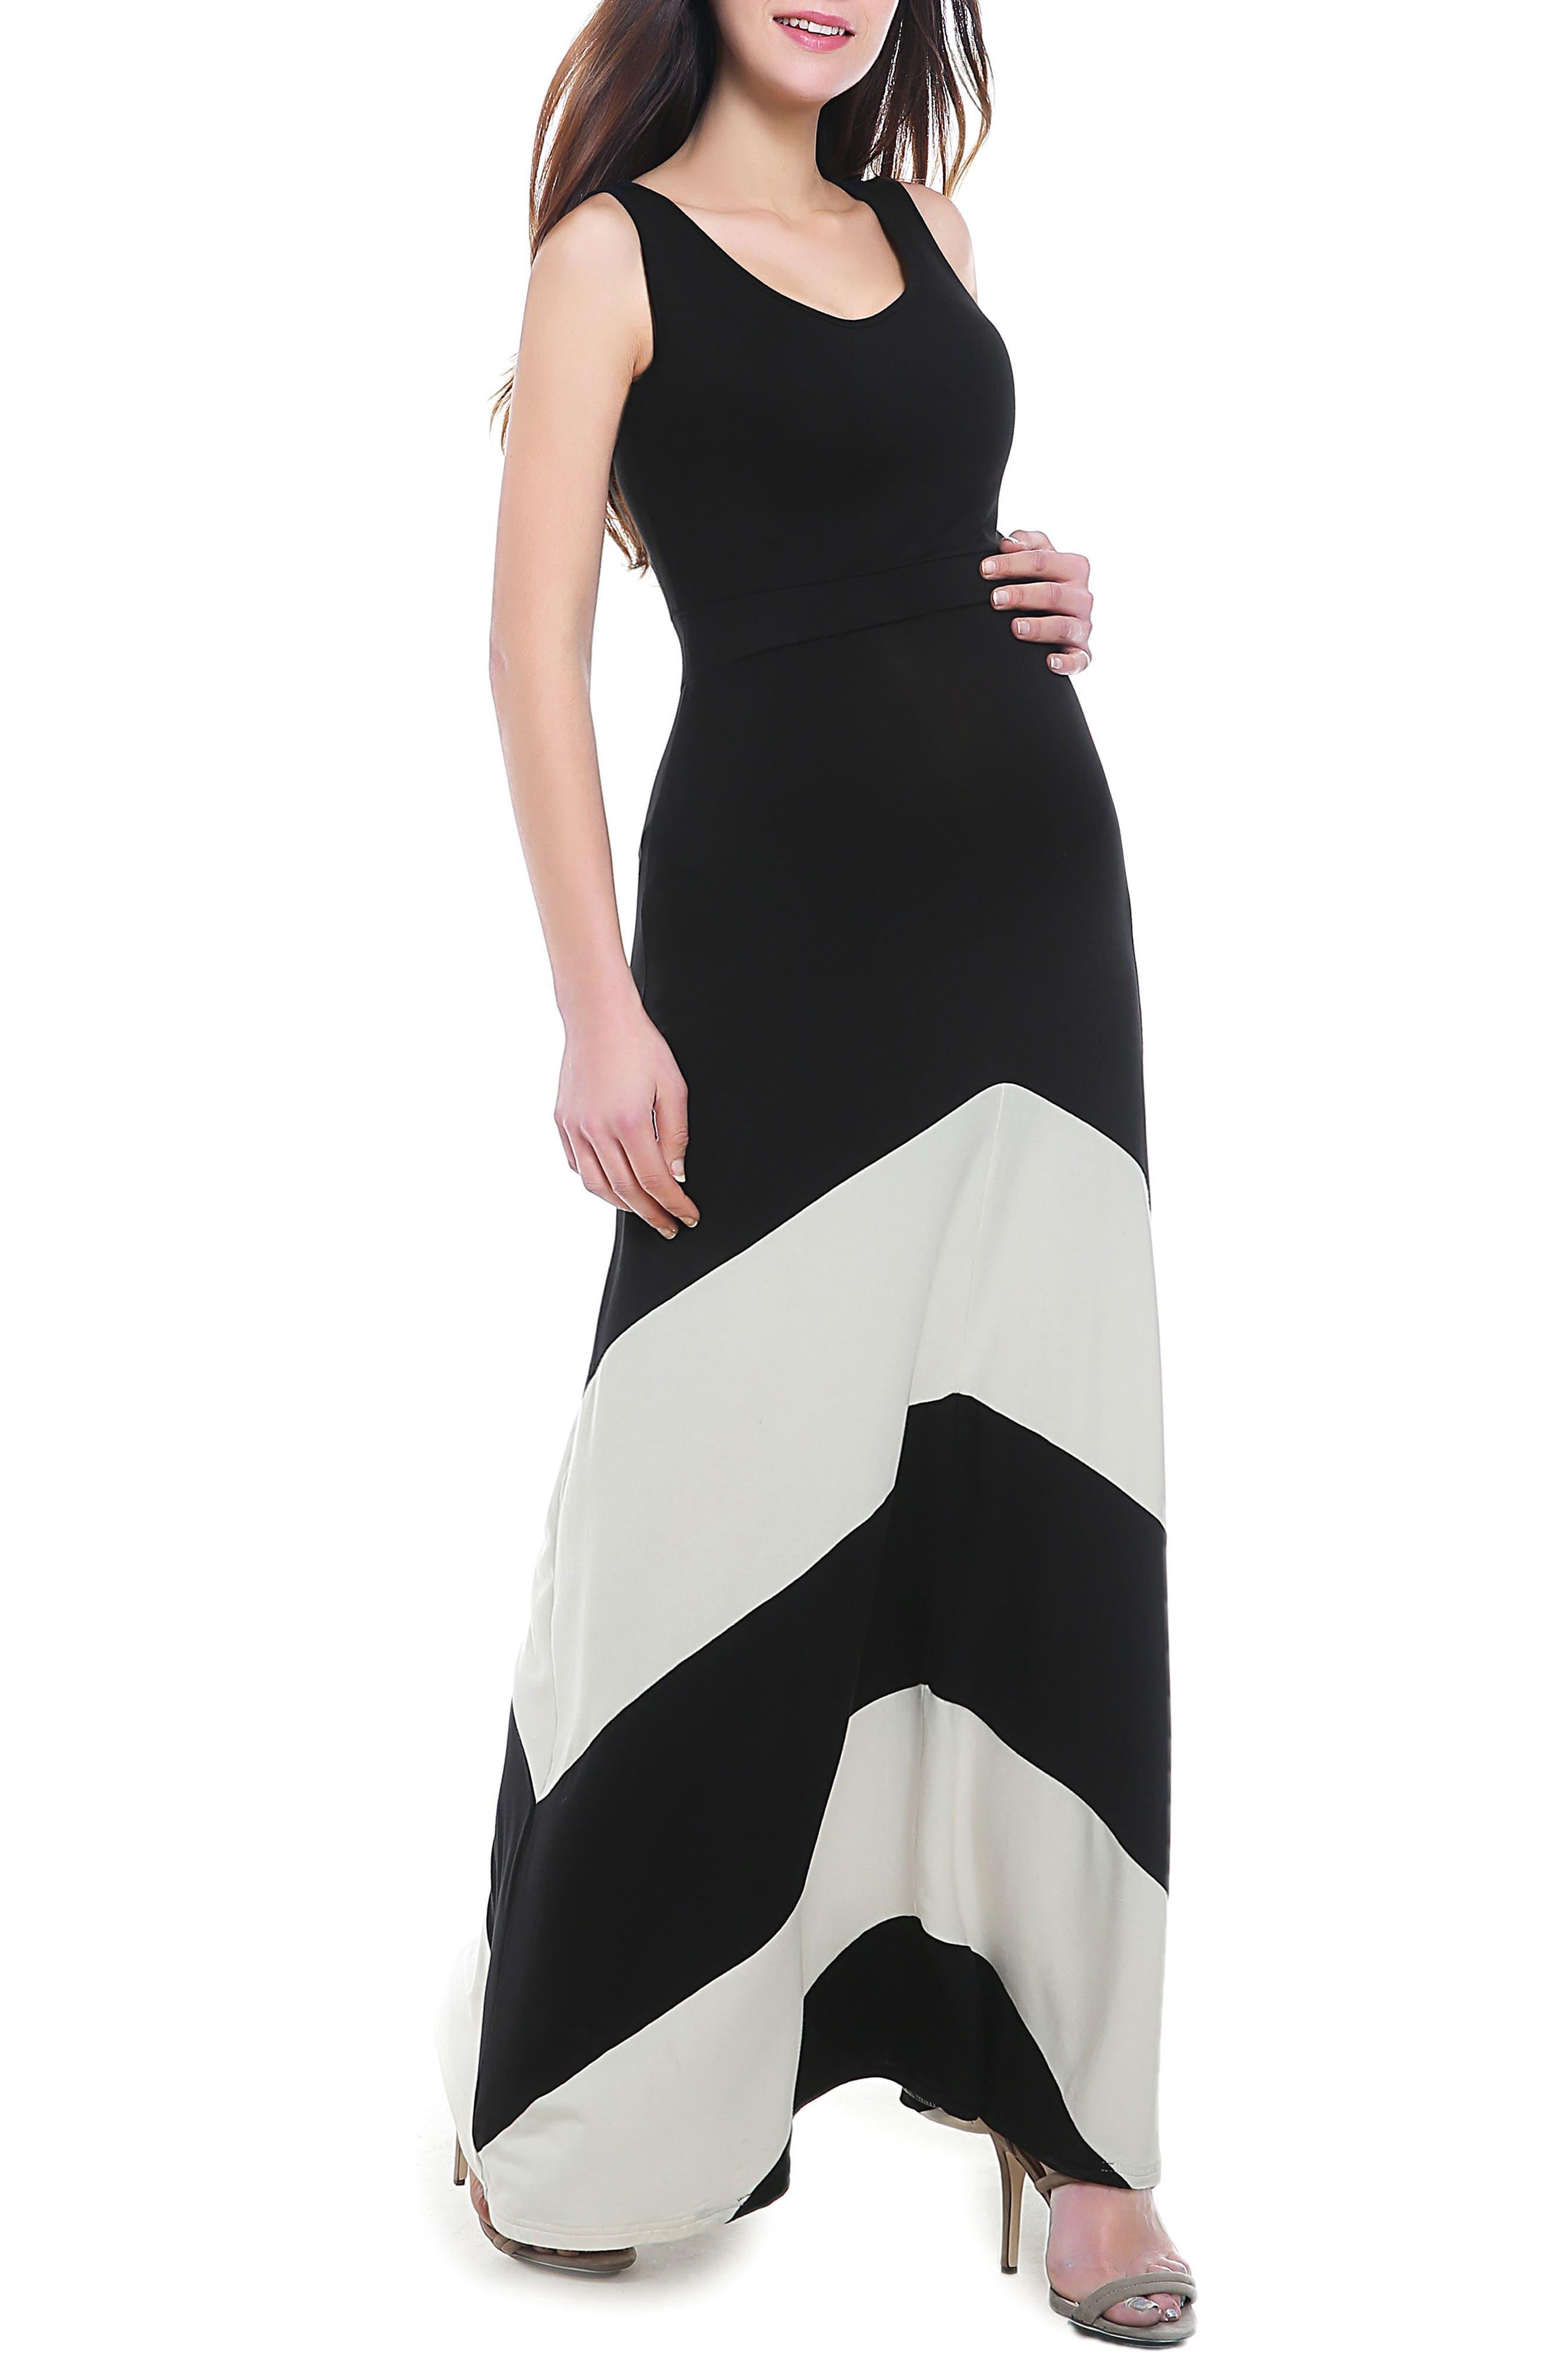 Sally Maternity Maxi Dress,                             Main thumbnail 1, color,                             BLACK/ WHITE